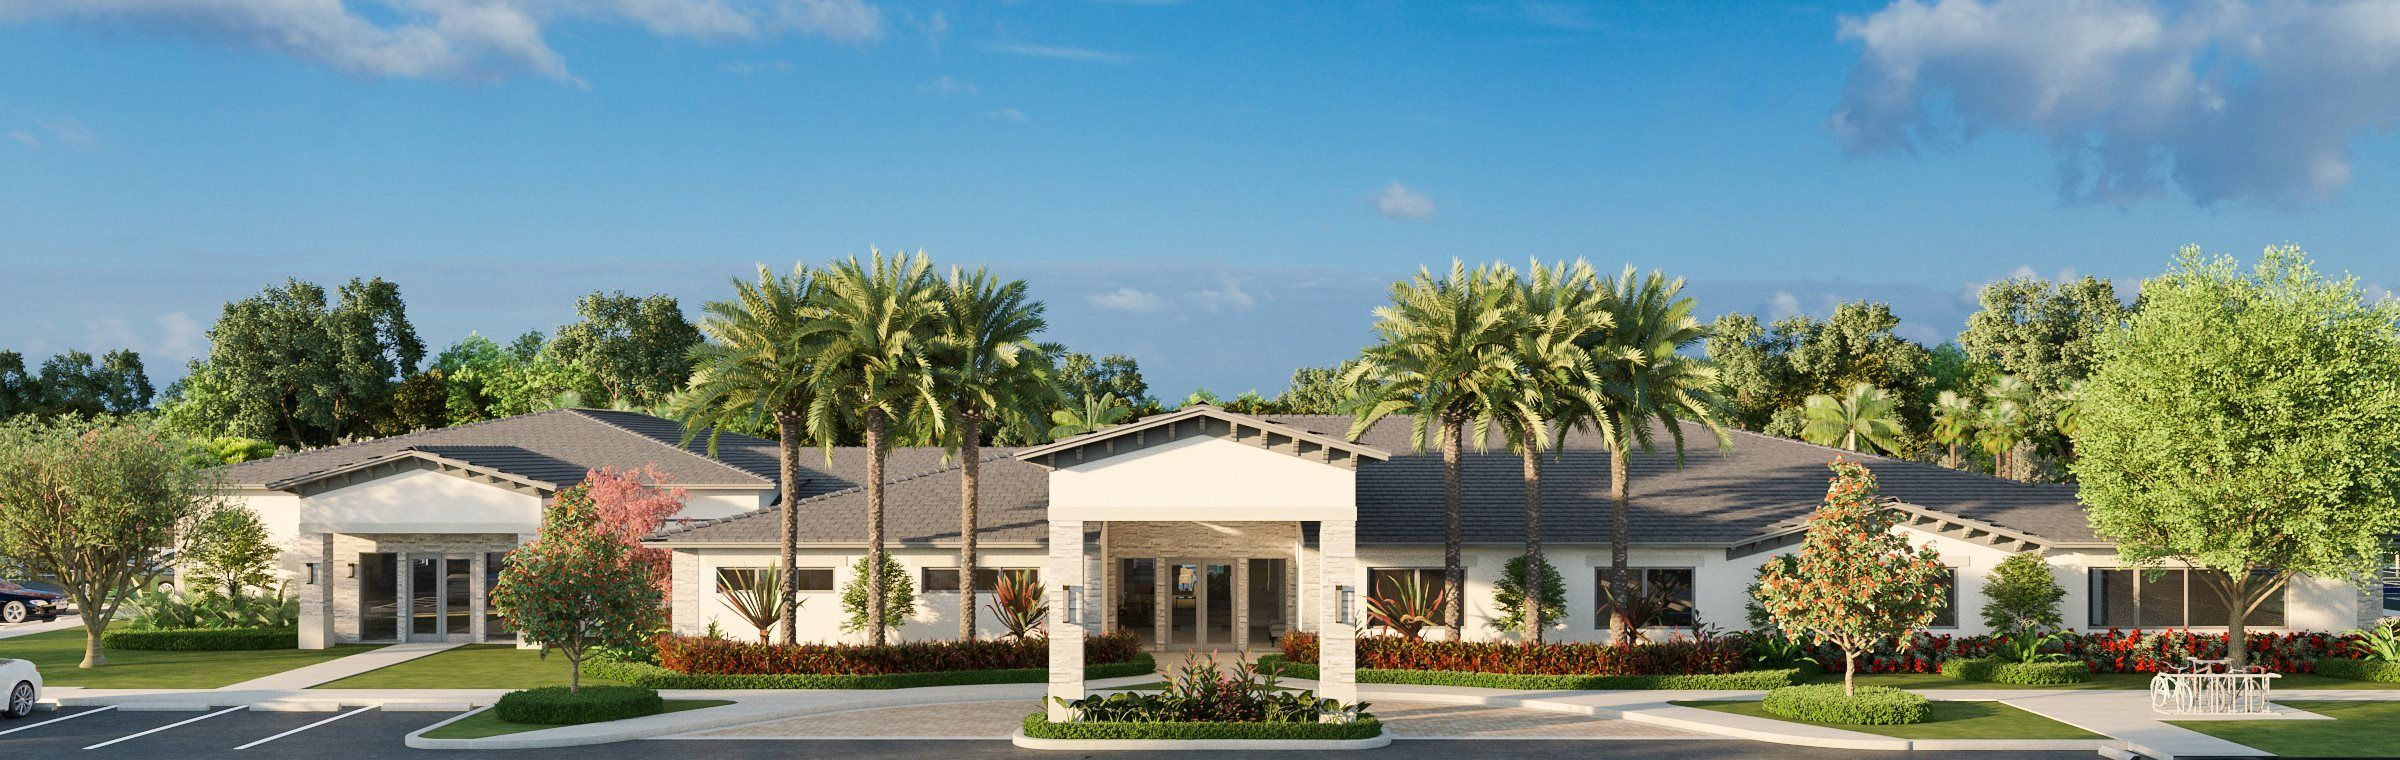 'Avalon Trails - Avalon Trails Villas' by Lennar - Palm Atlantic in Palm Beach County